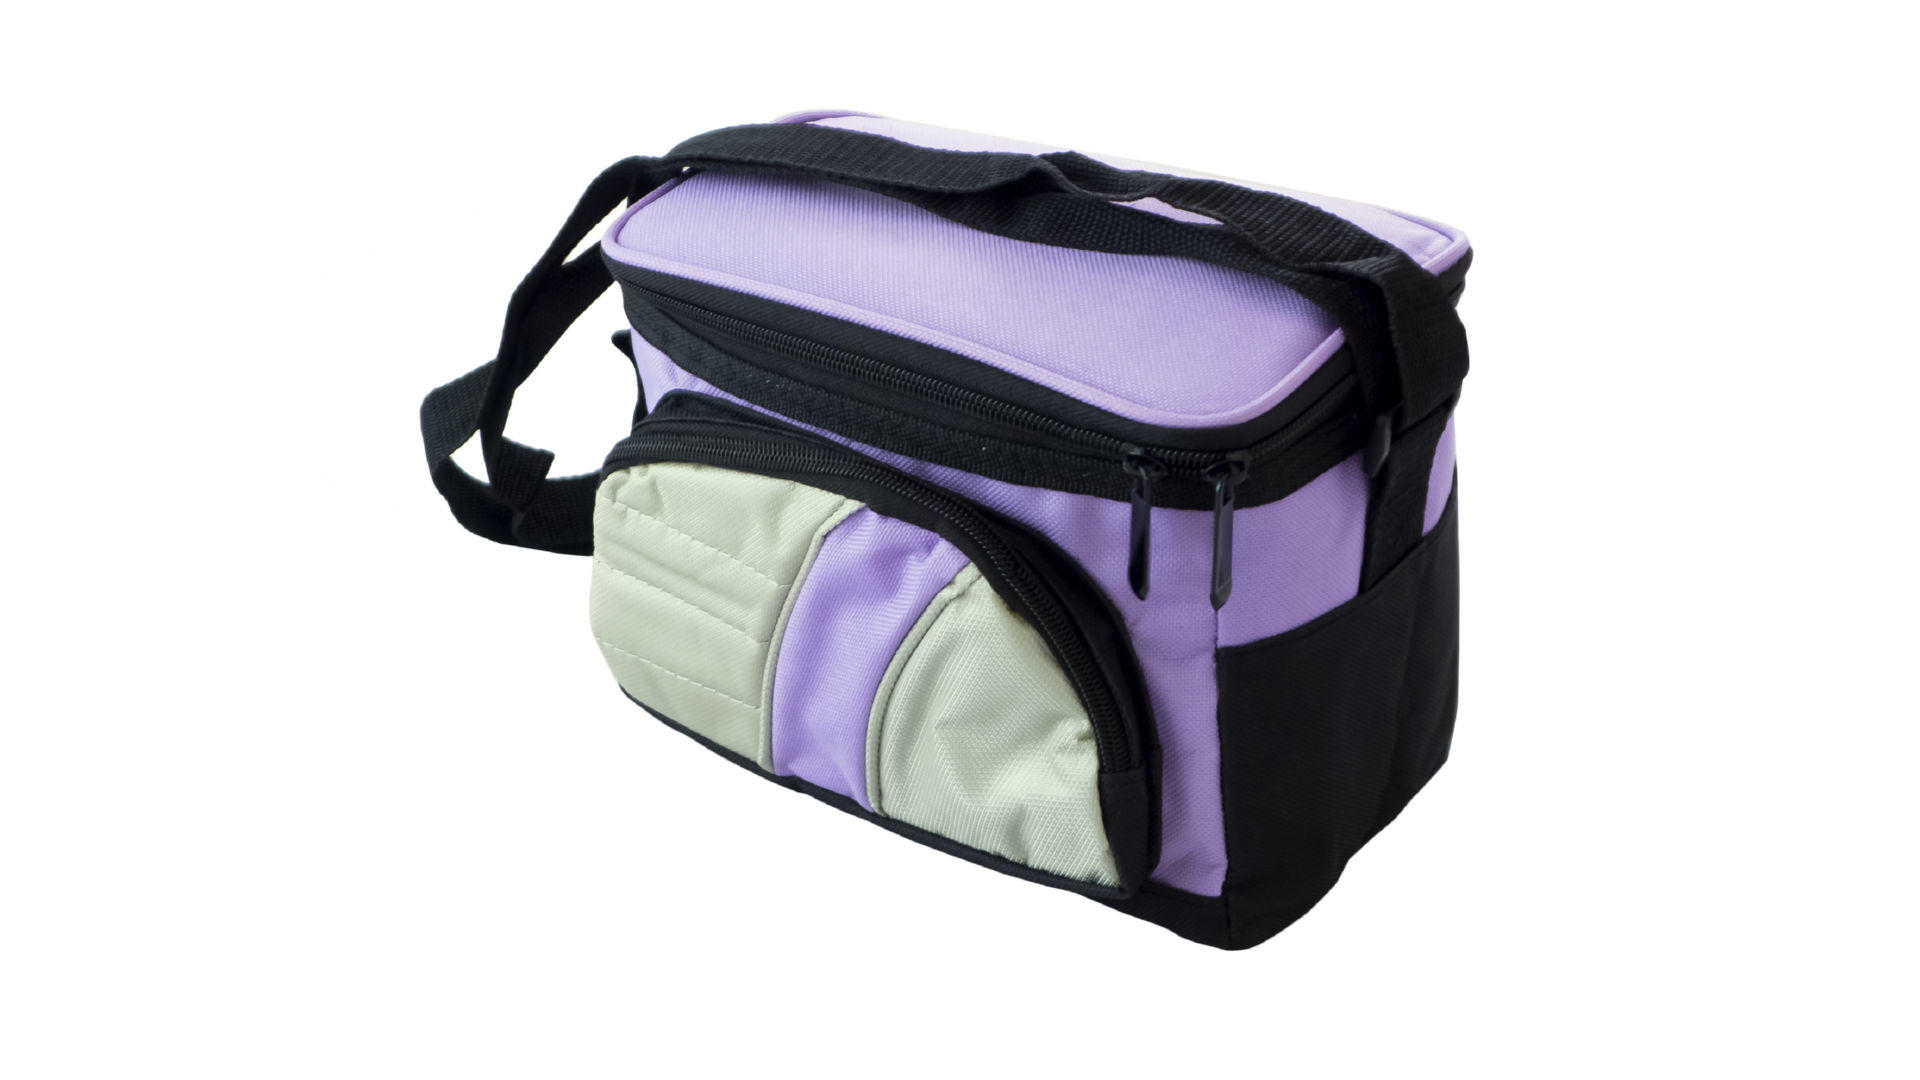 Термосумка PRC - Cooling Bag 220 x 120 x 170 мм 3